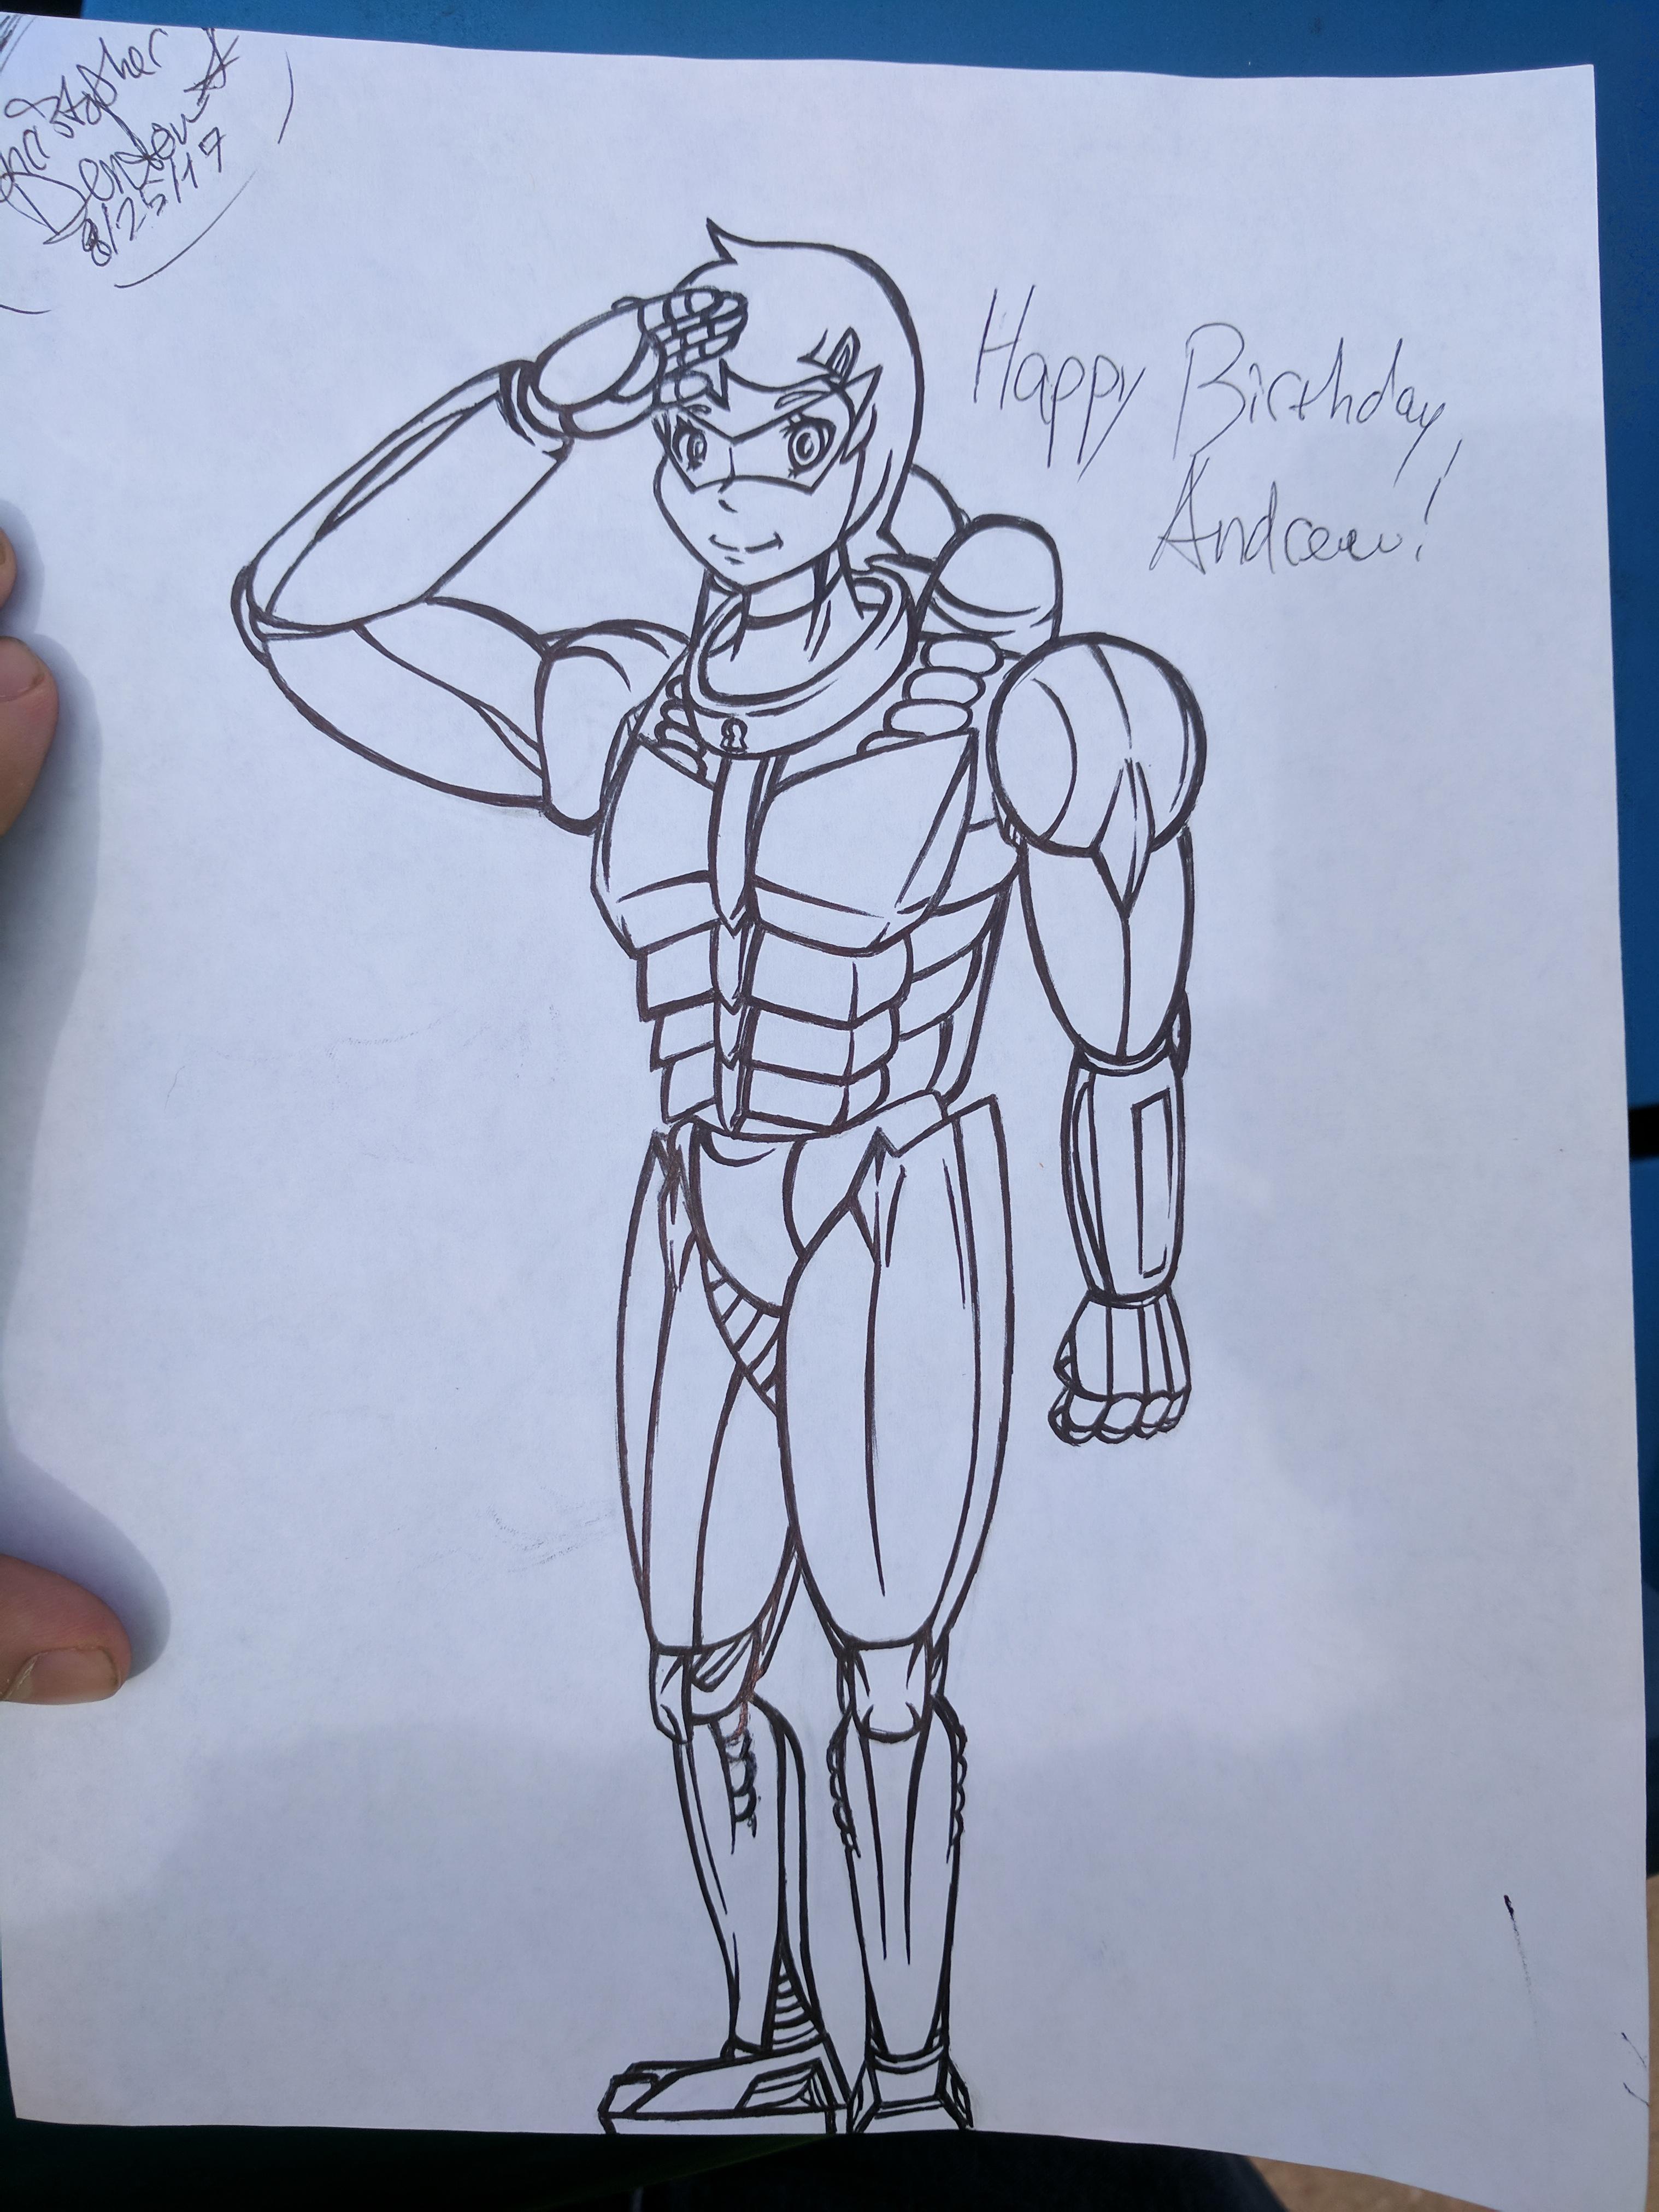 Happy Birthday to my brother